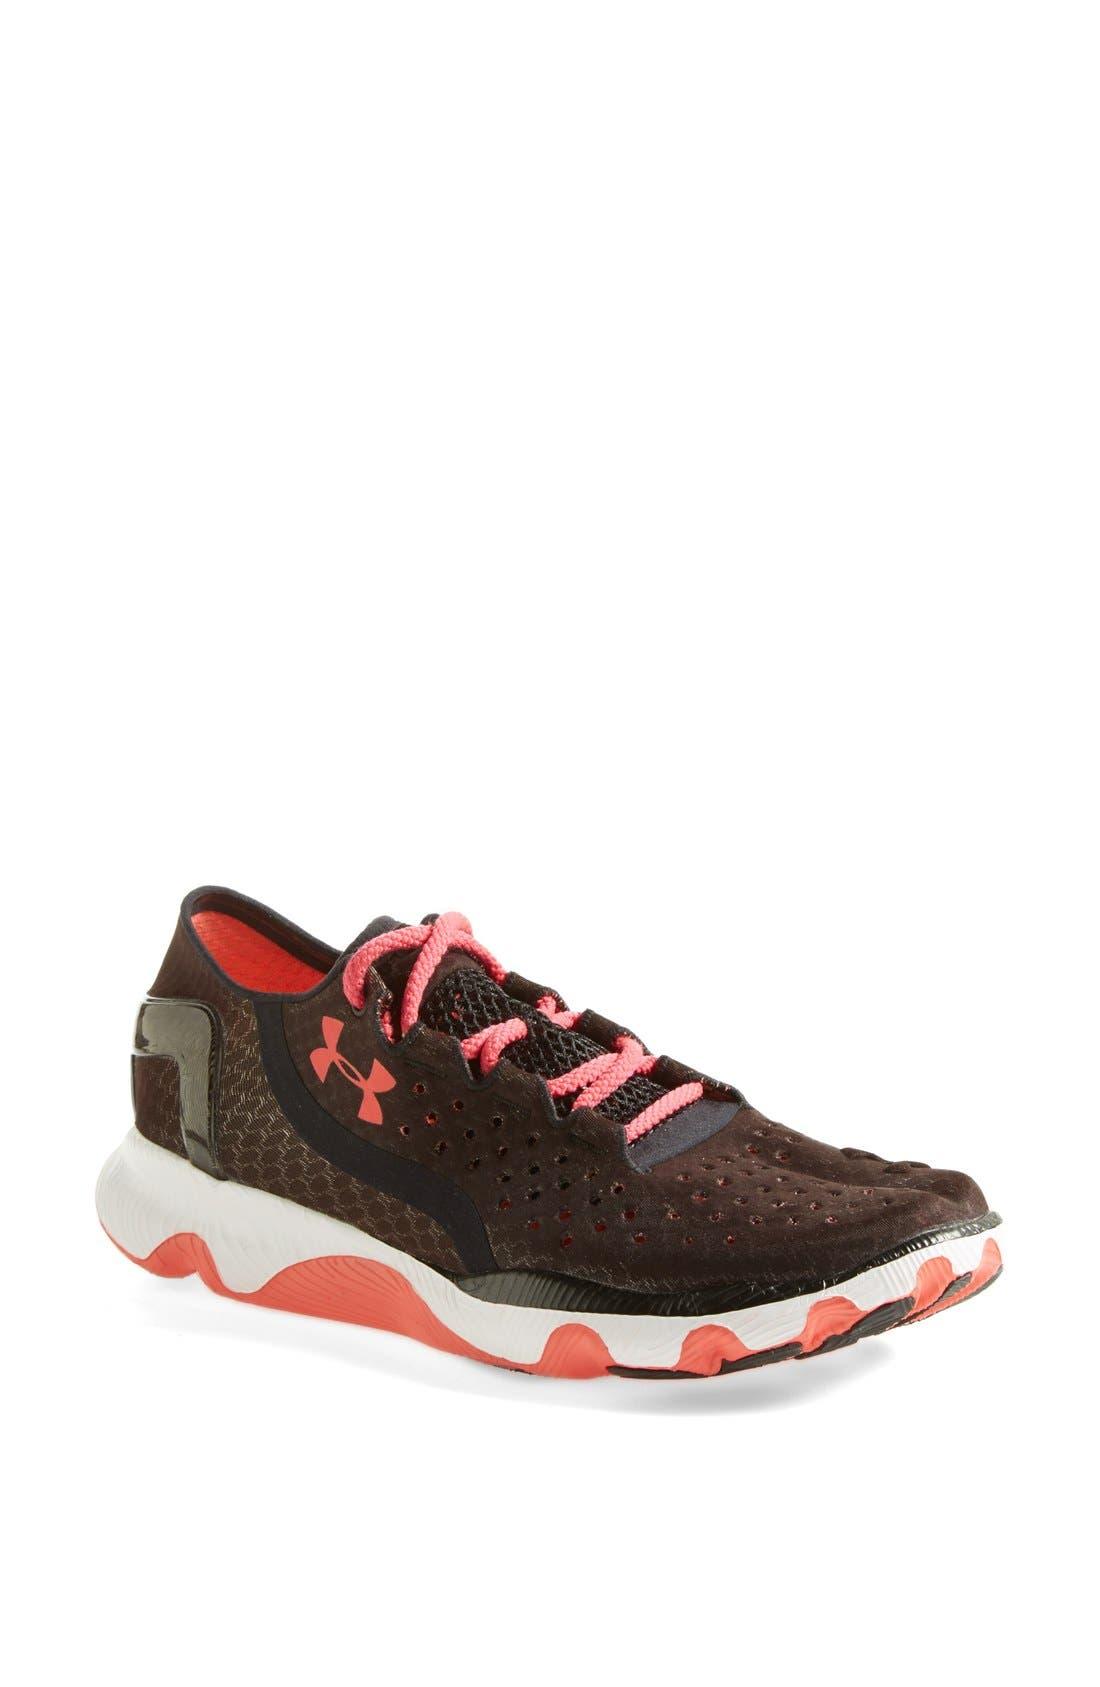 Main Image - Under Armour 'Speedform' Running Shoe (Women)